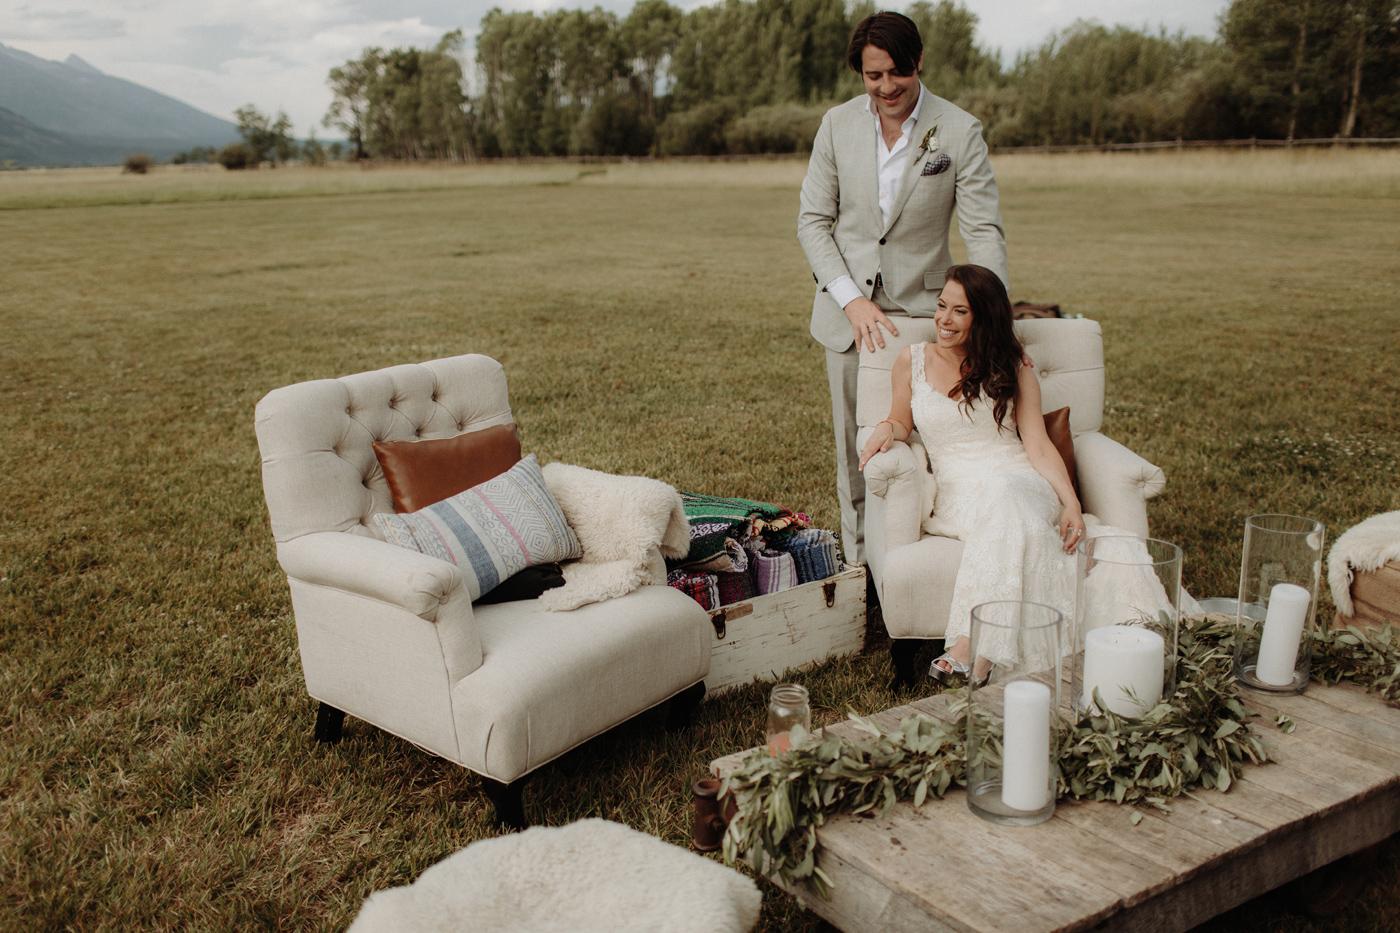 063-grand-teton-jackson-hole-wyoming-wedding.jpg